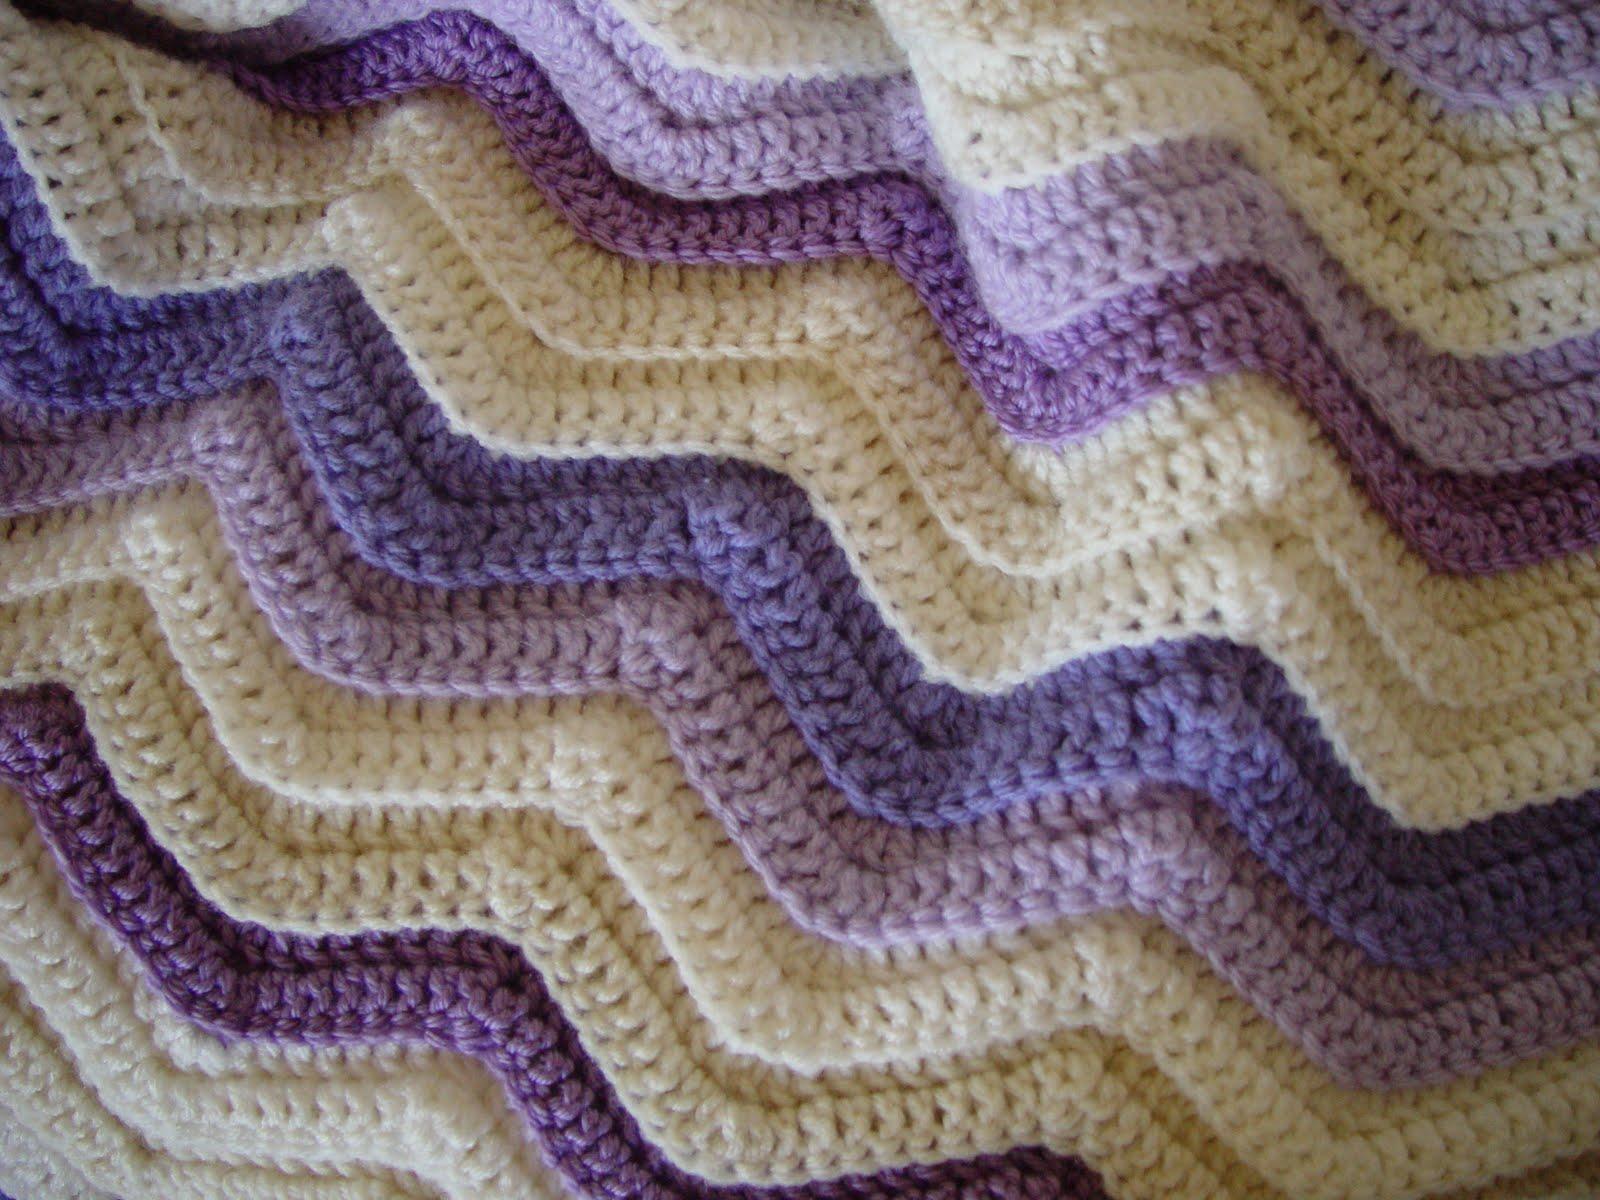 Double Crochet Ripple Patterns Crochet And Knitting Patterns